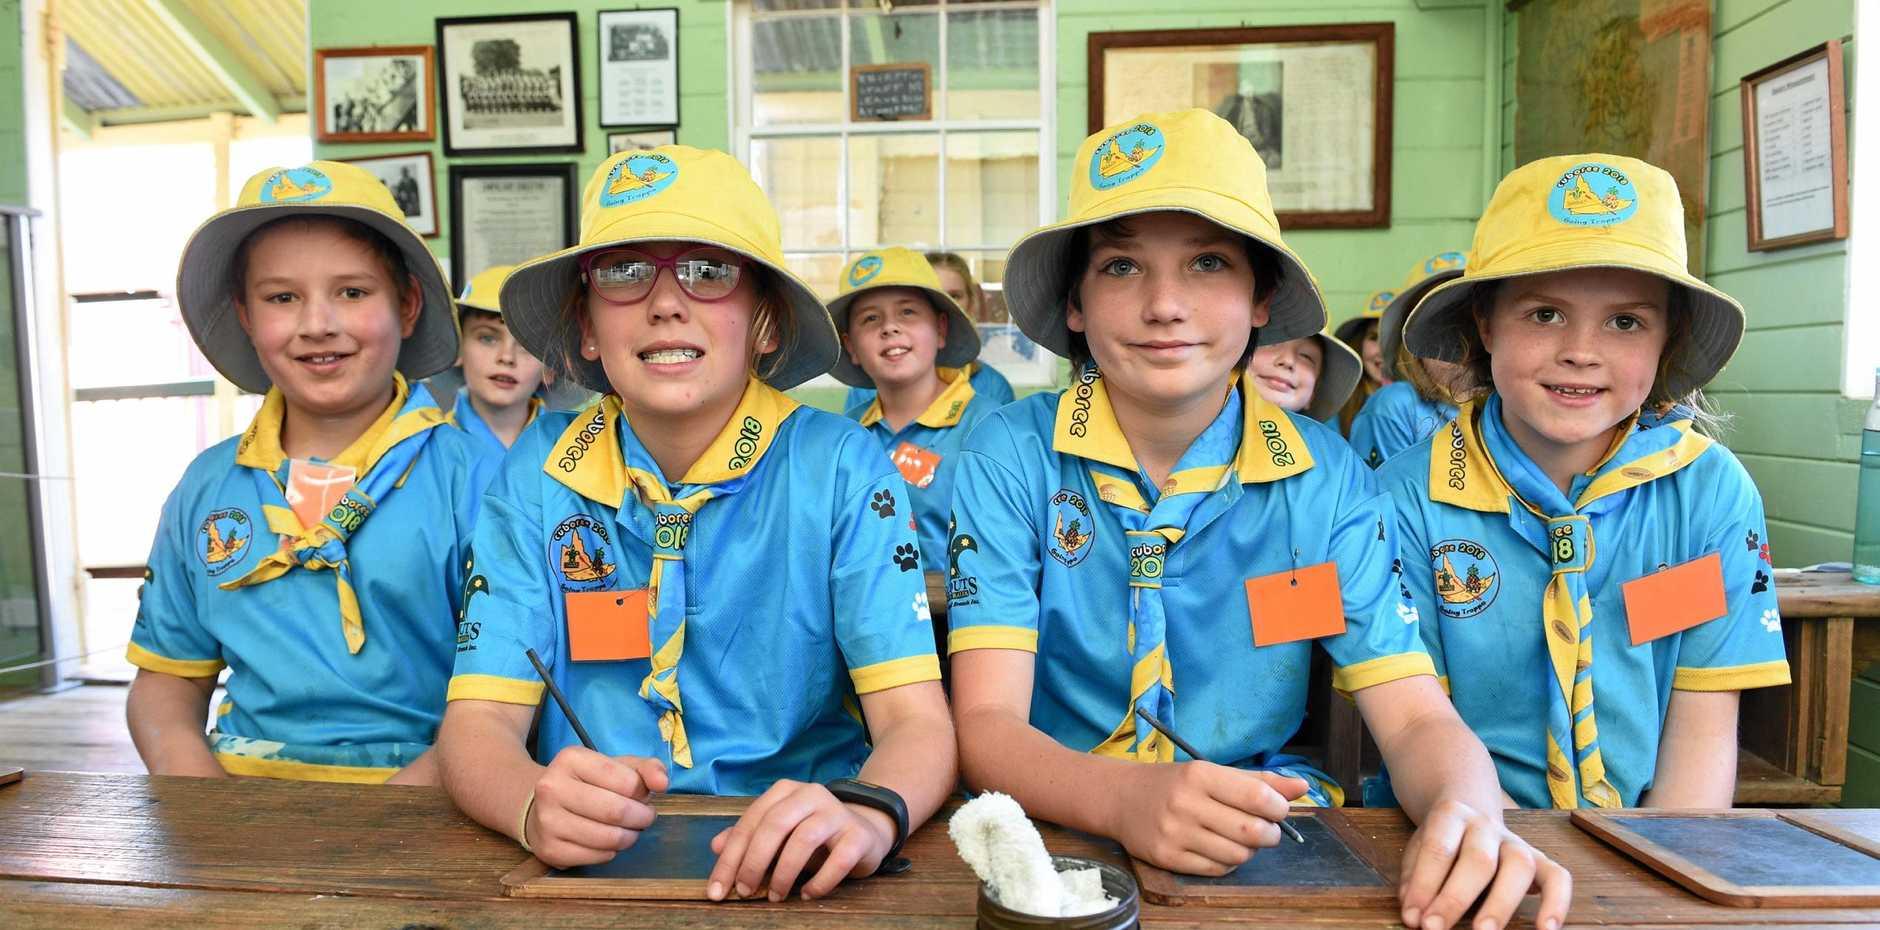 Fifth Queensland Cuboree 2018 visit Hervey Bay Historical Village & Museum - (L) Hamish Slattery (Albany Creek), Jorja Cairns (Goondiwindi), Sam Gaylard (Nambour) and Hayley Apps (Marsden) in the school house.